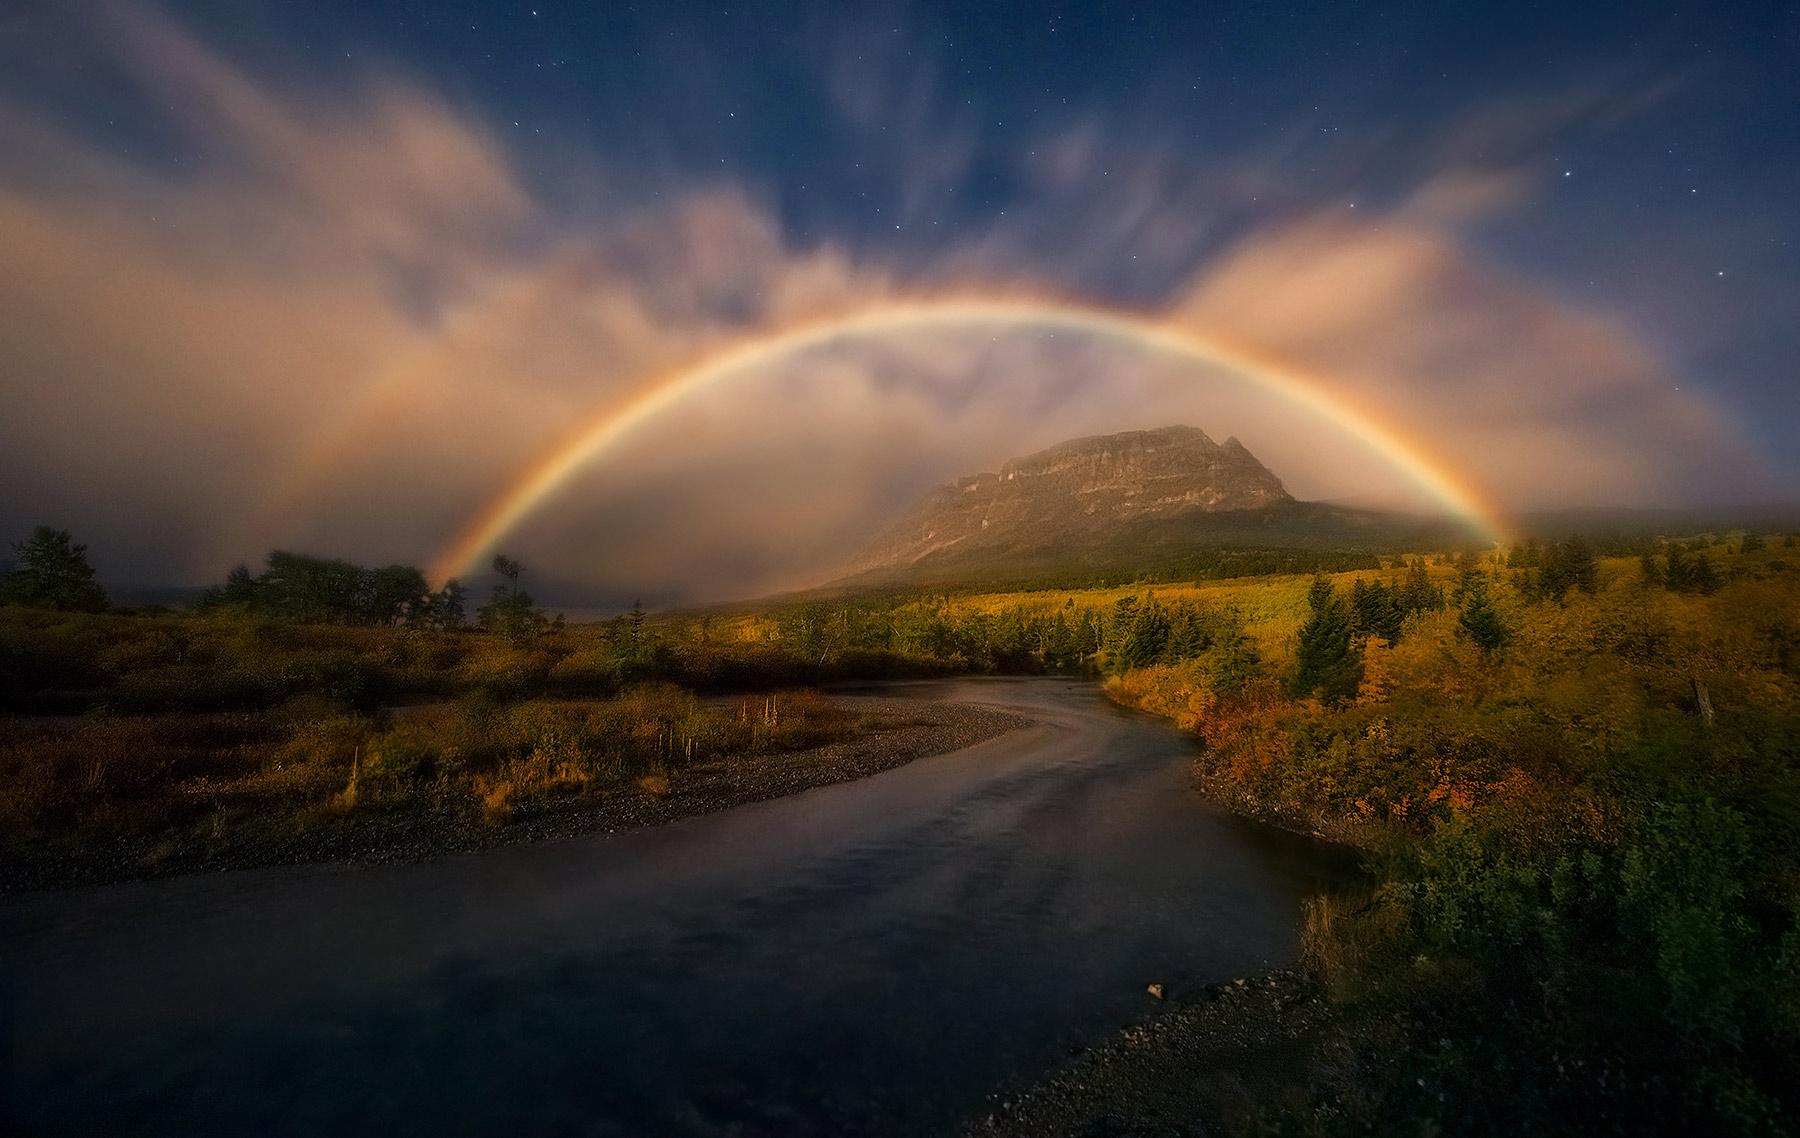 Moon, Moonlight, Moonbow, Rainbow, Night, Glacier, Montana, Autumn, photo